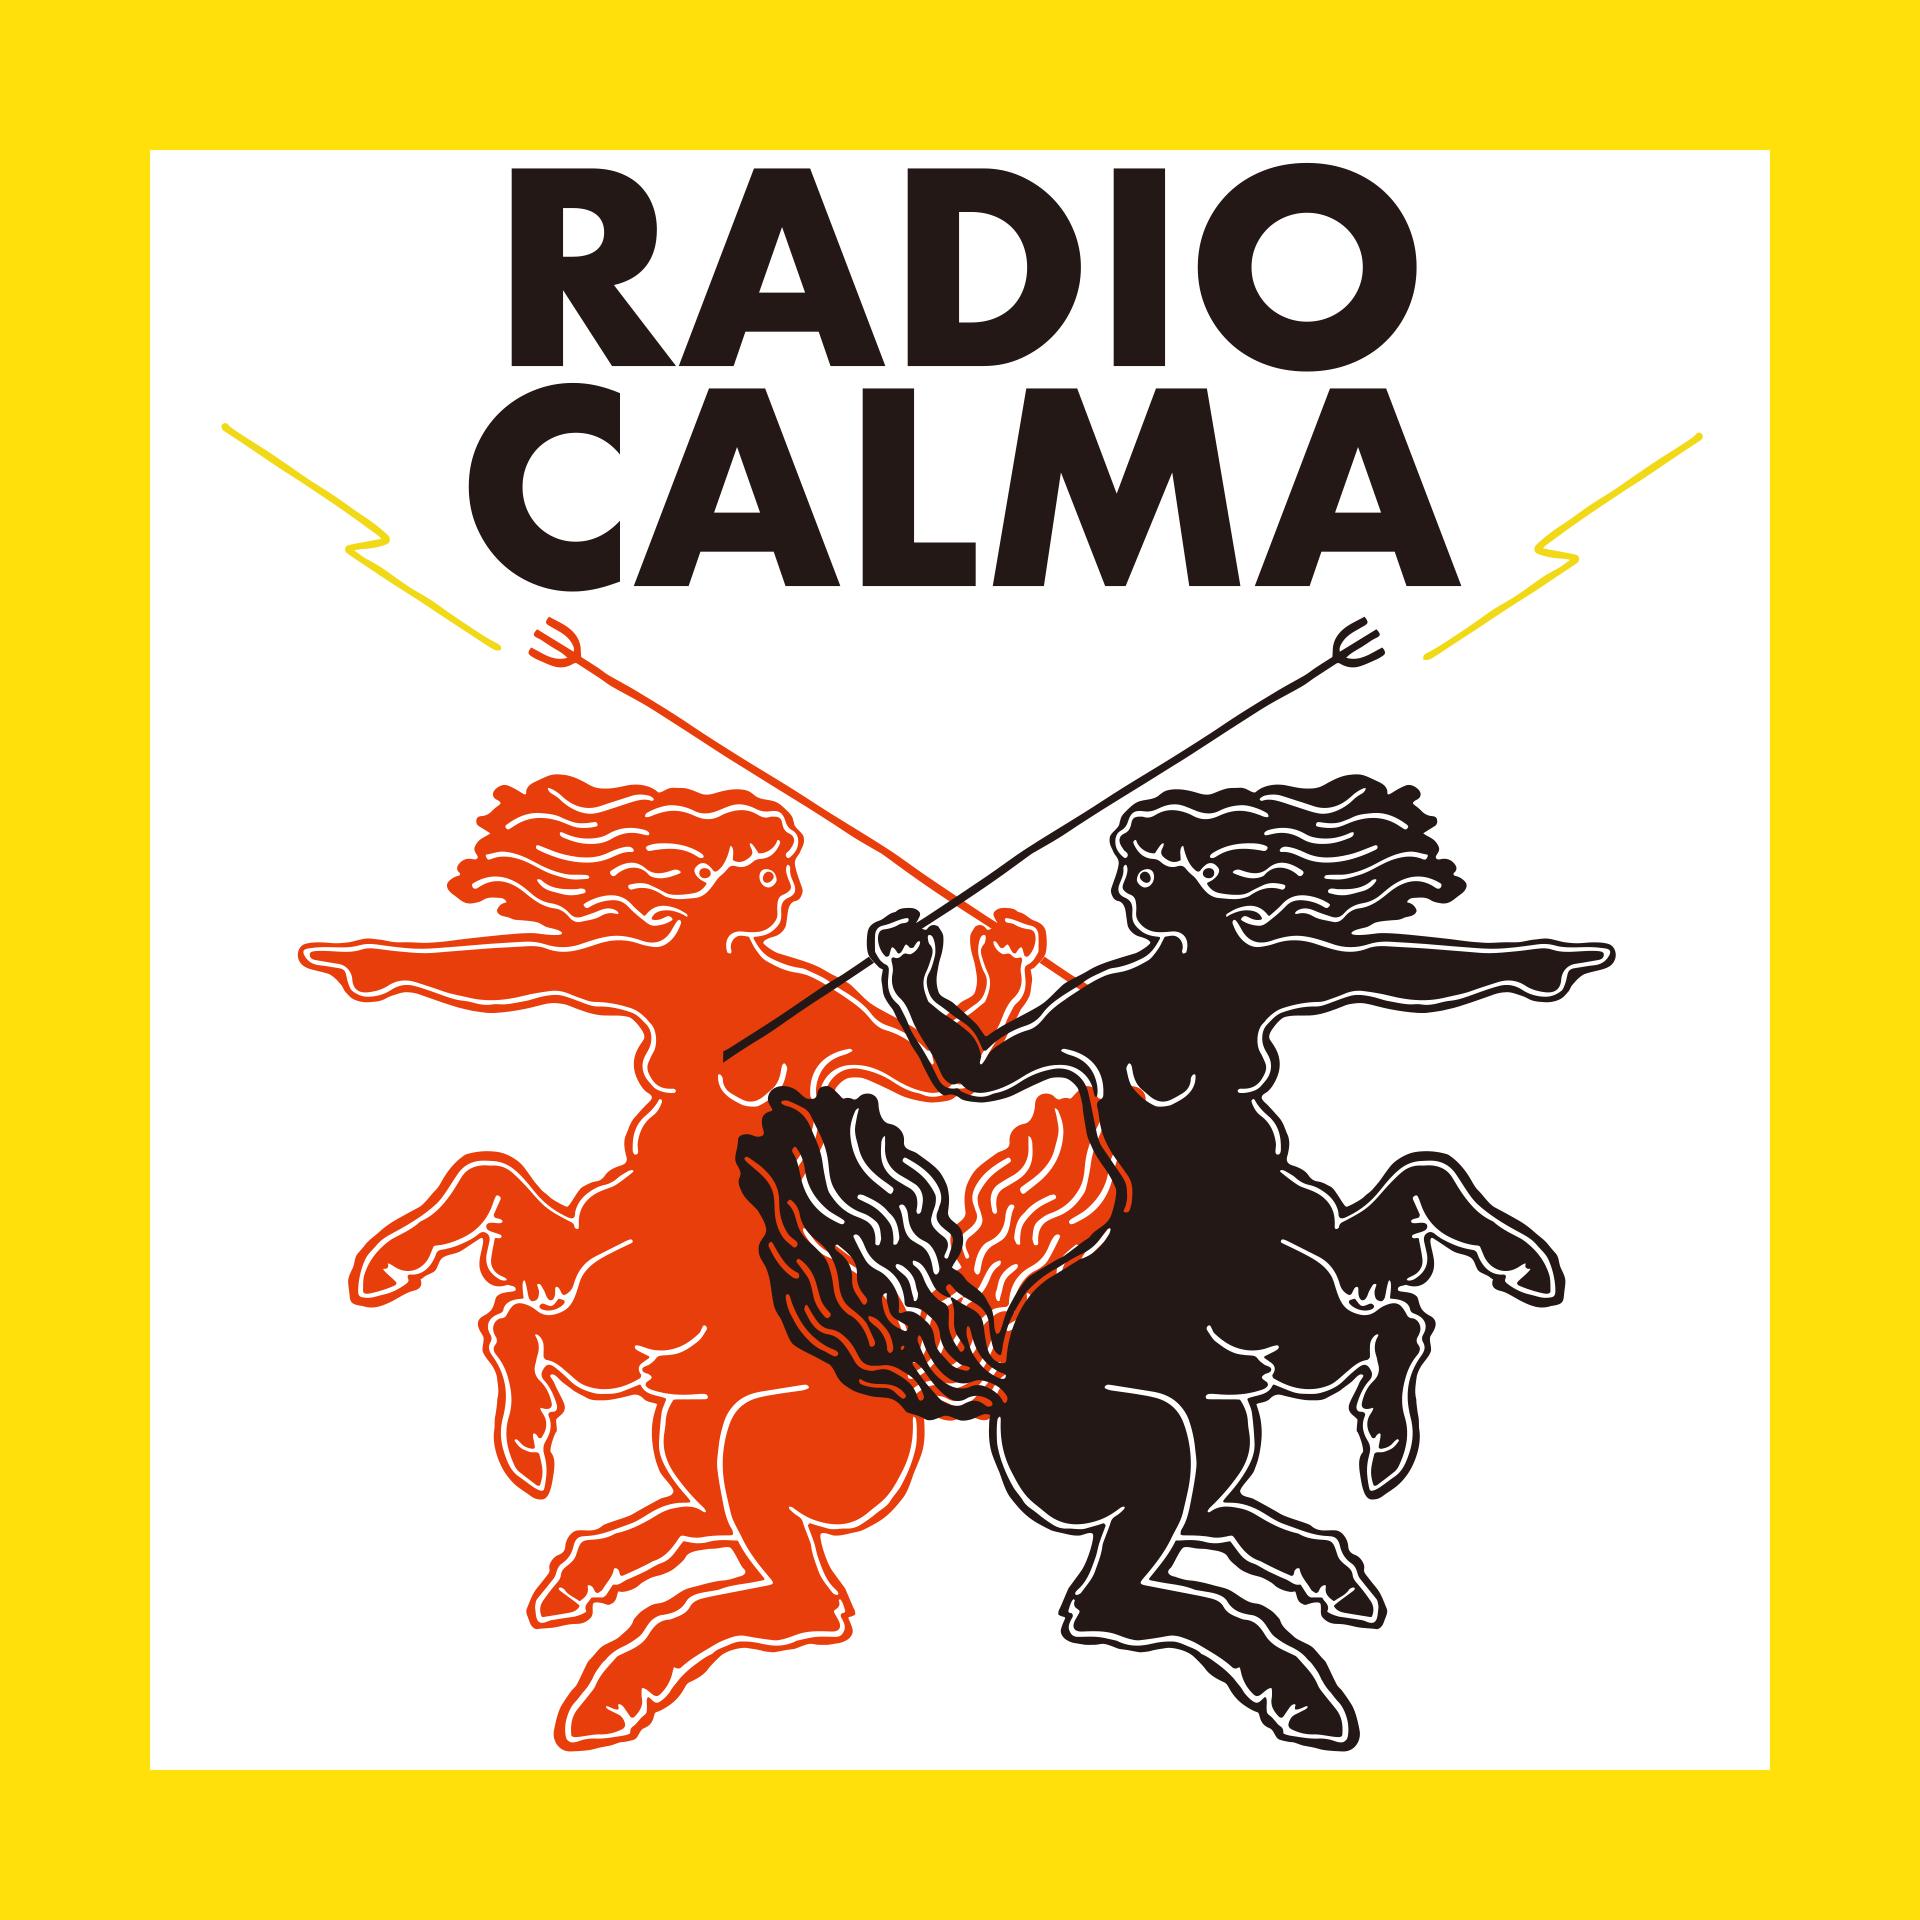 RADIO CALMA